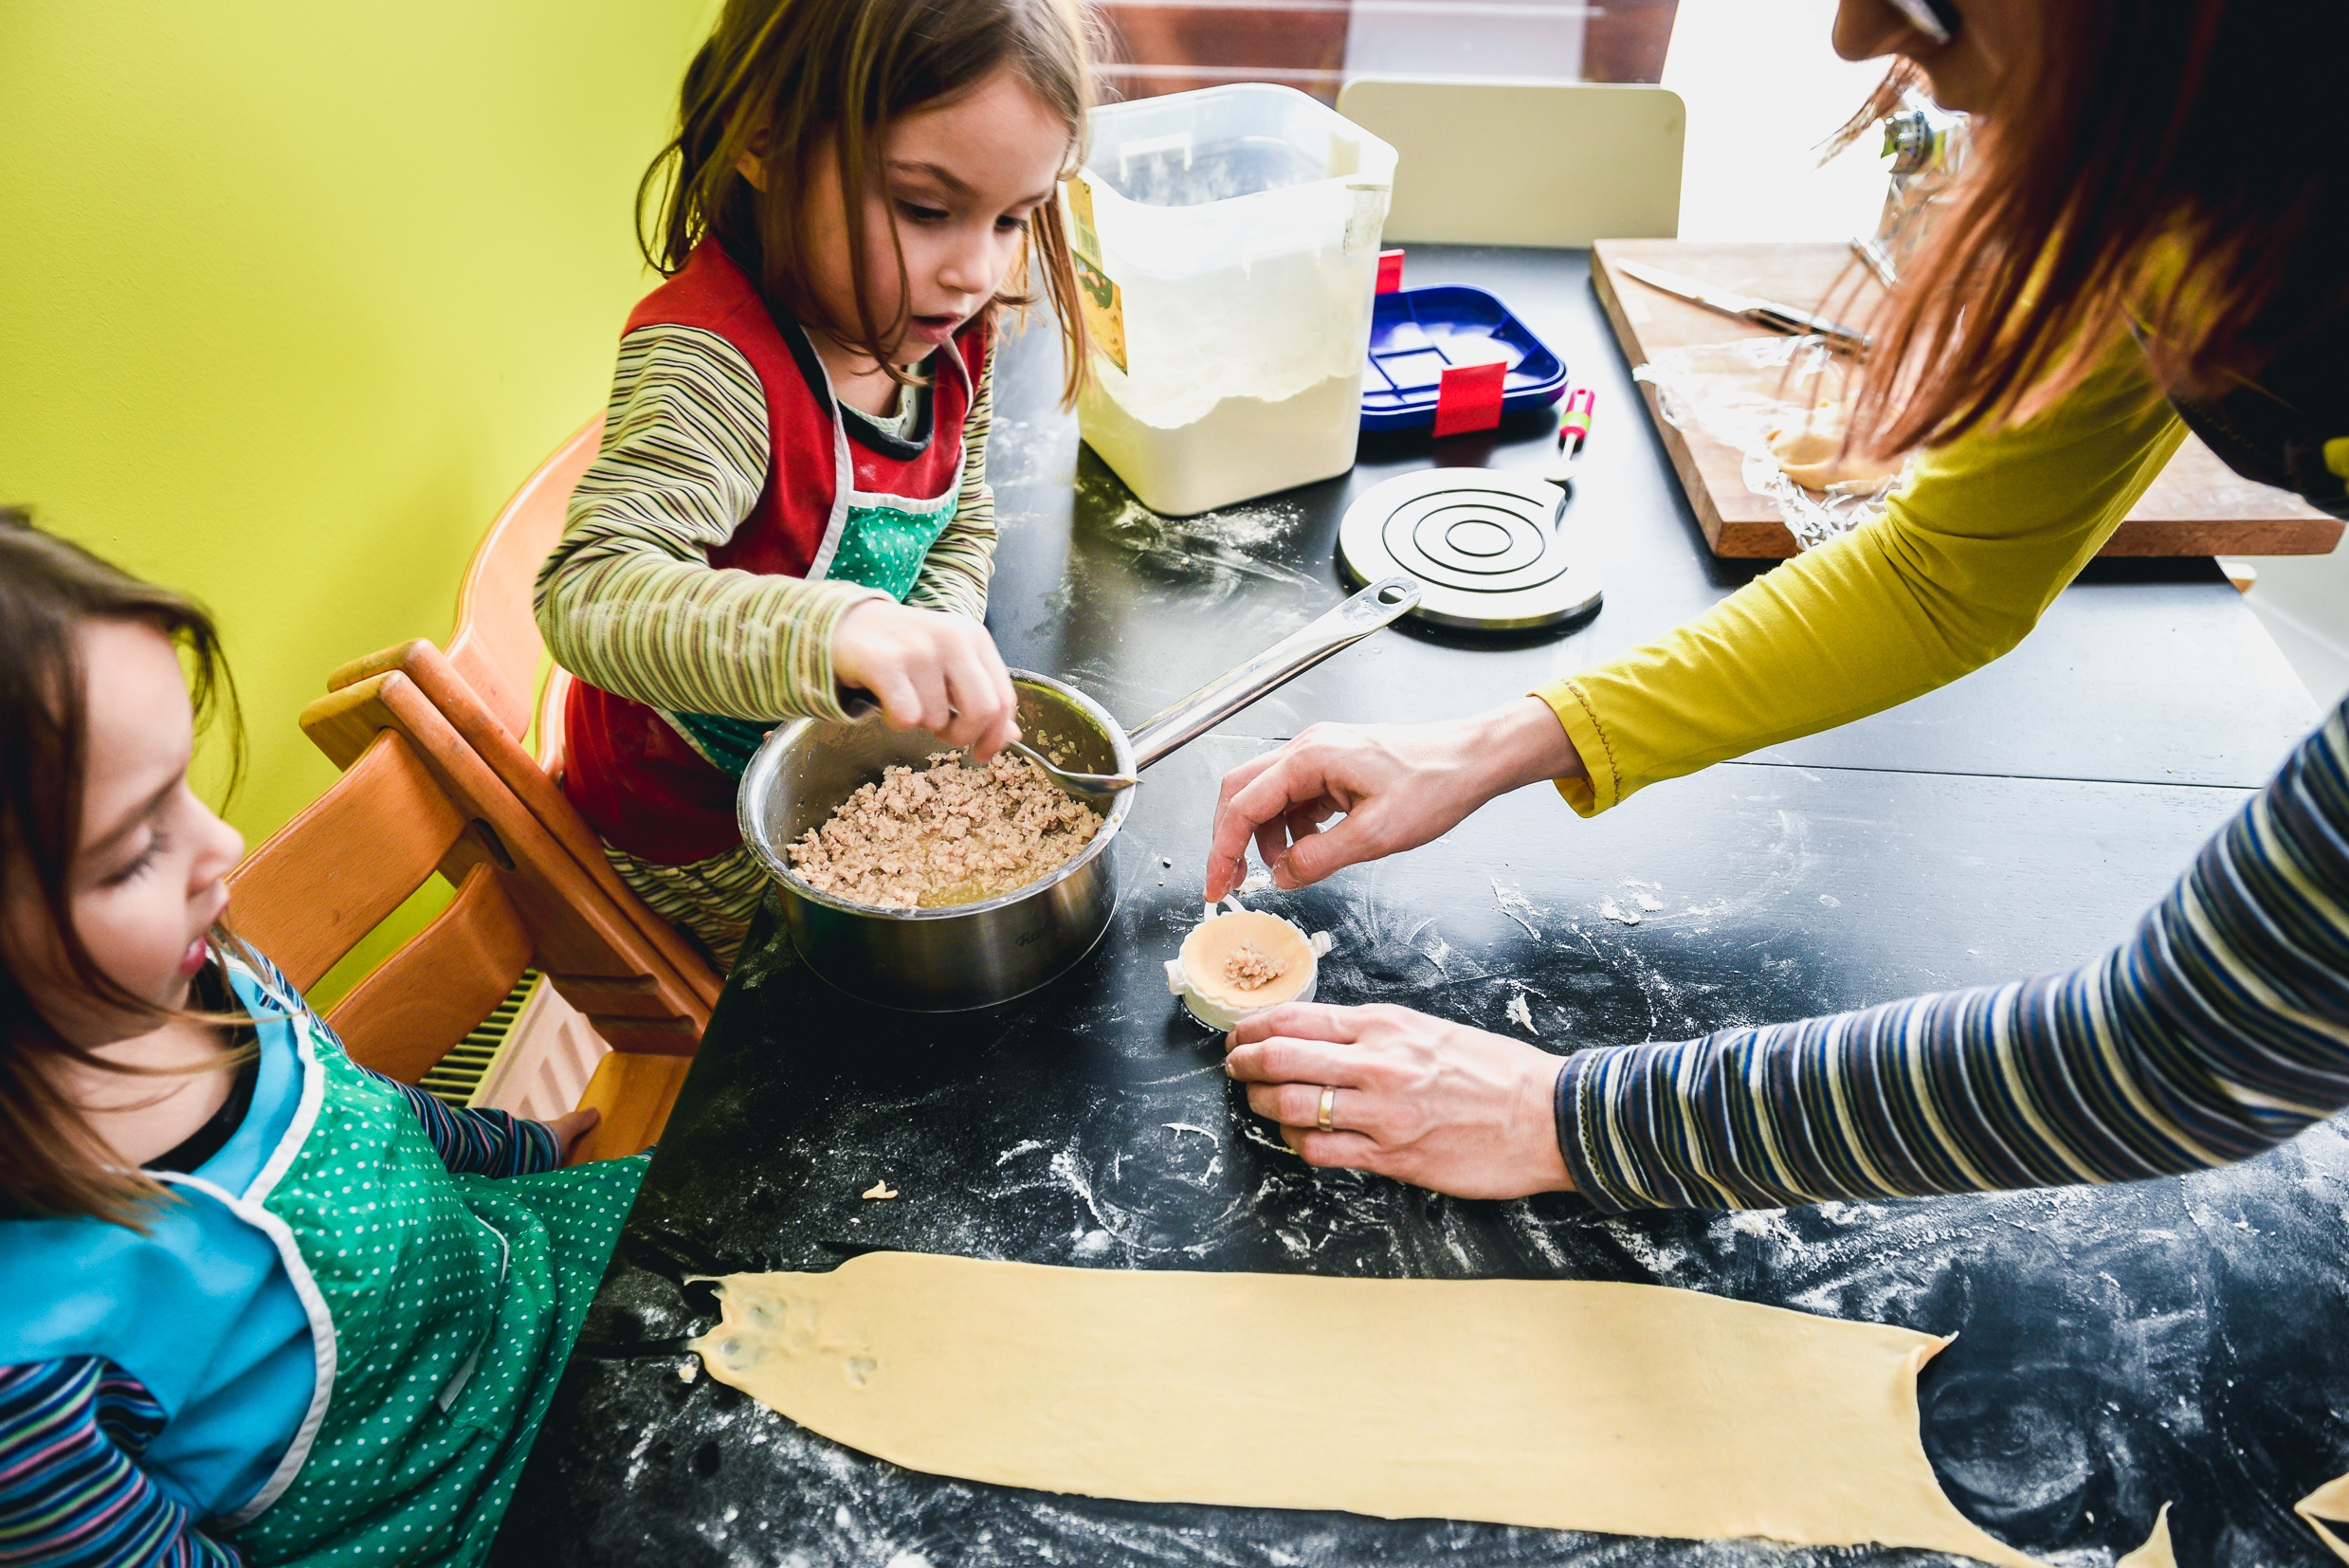 Extracurricular-Activities-cooking.jpg